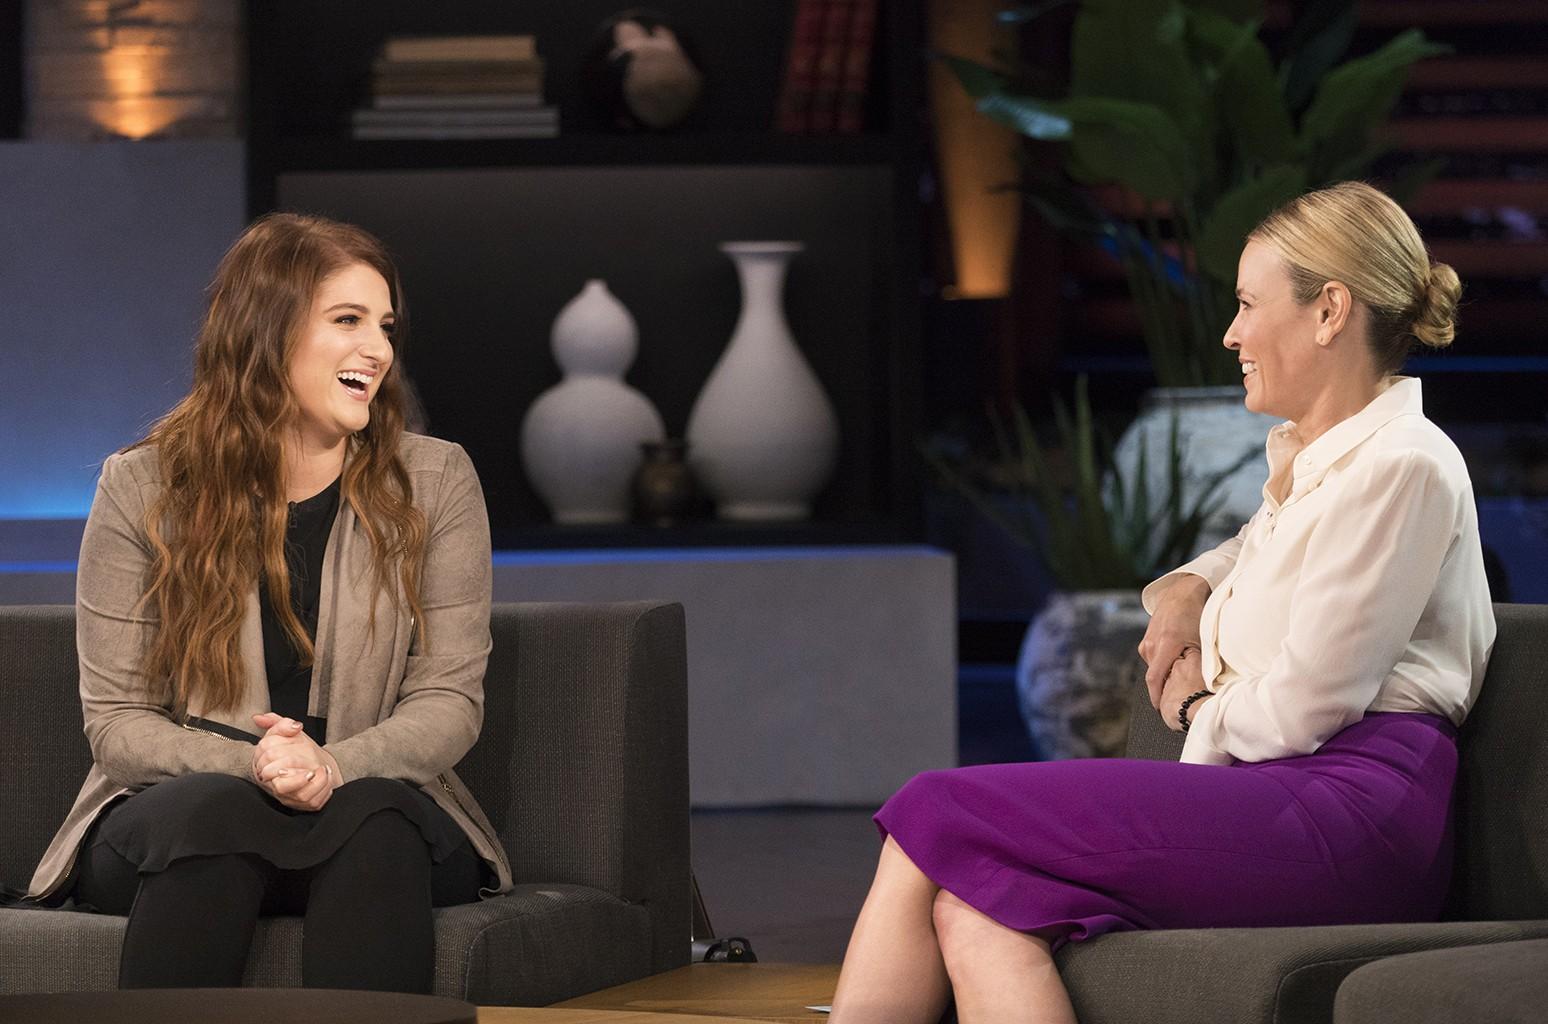 Meghan Trainor and Chelsea Handler